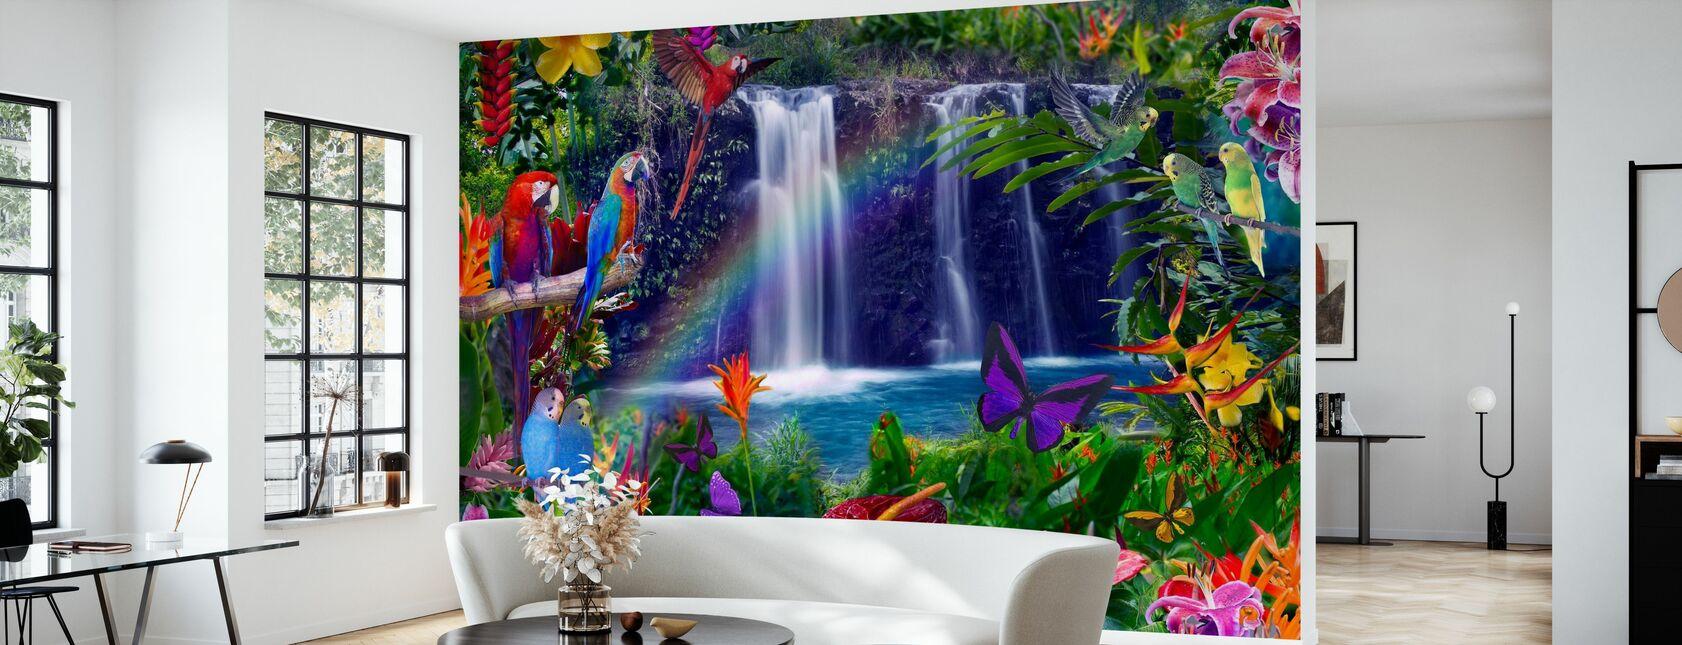 Hana Rainbow Waterfall - Wallpaper - Living Room